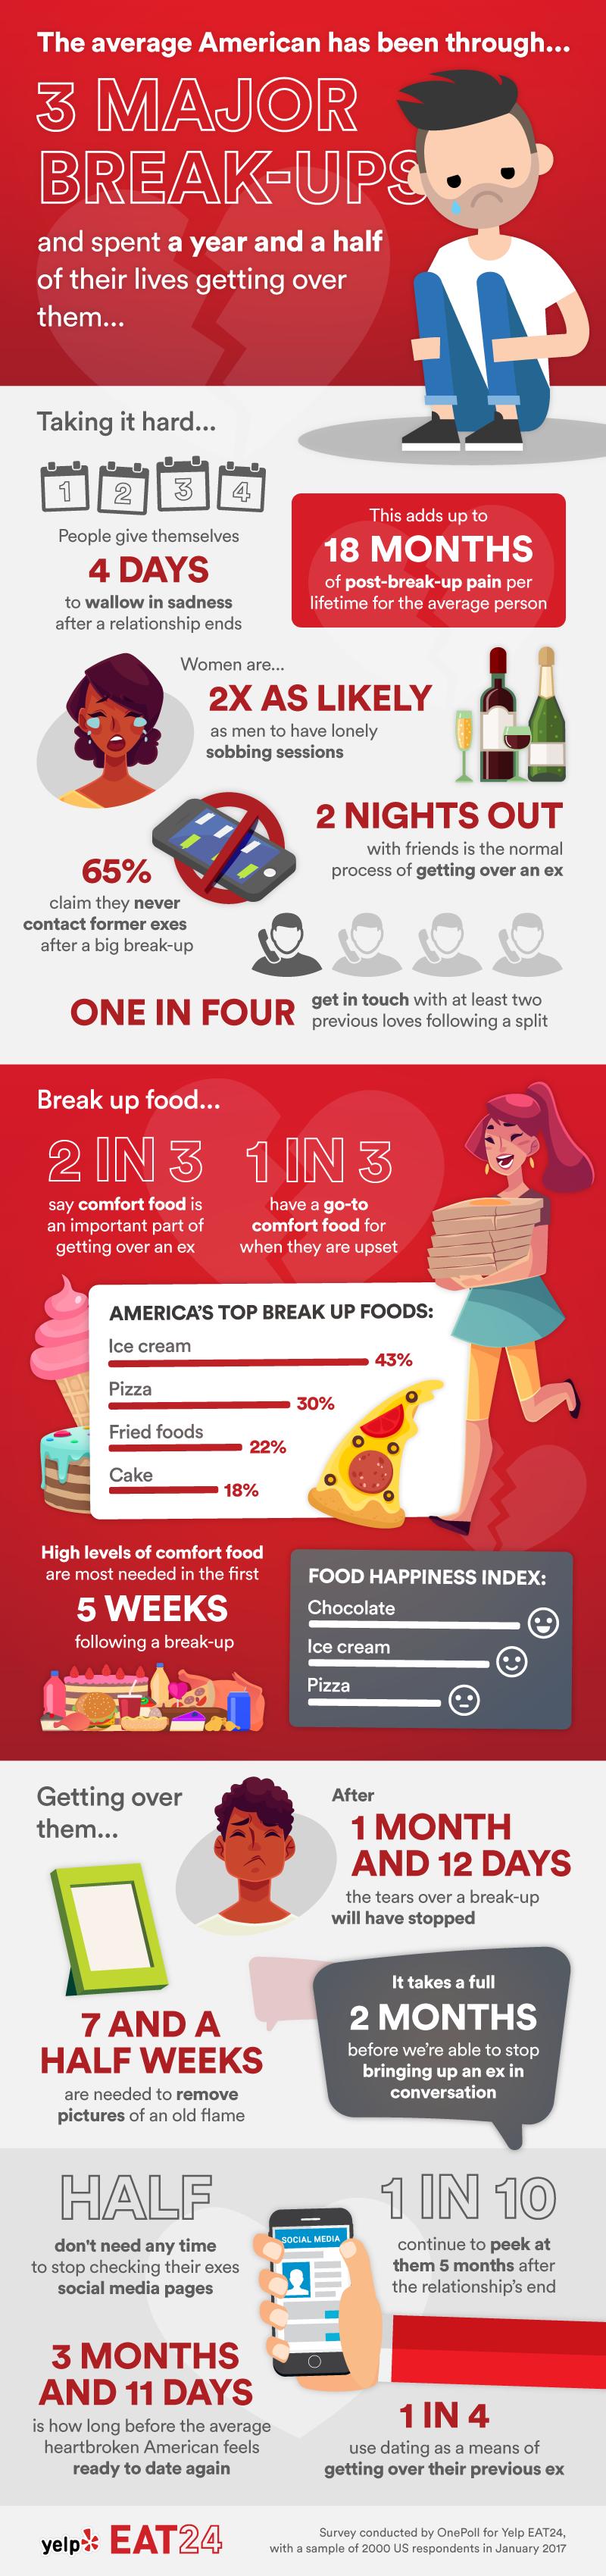 Eat 24 Break Up Infographic